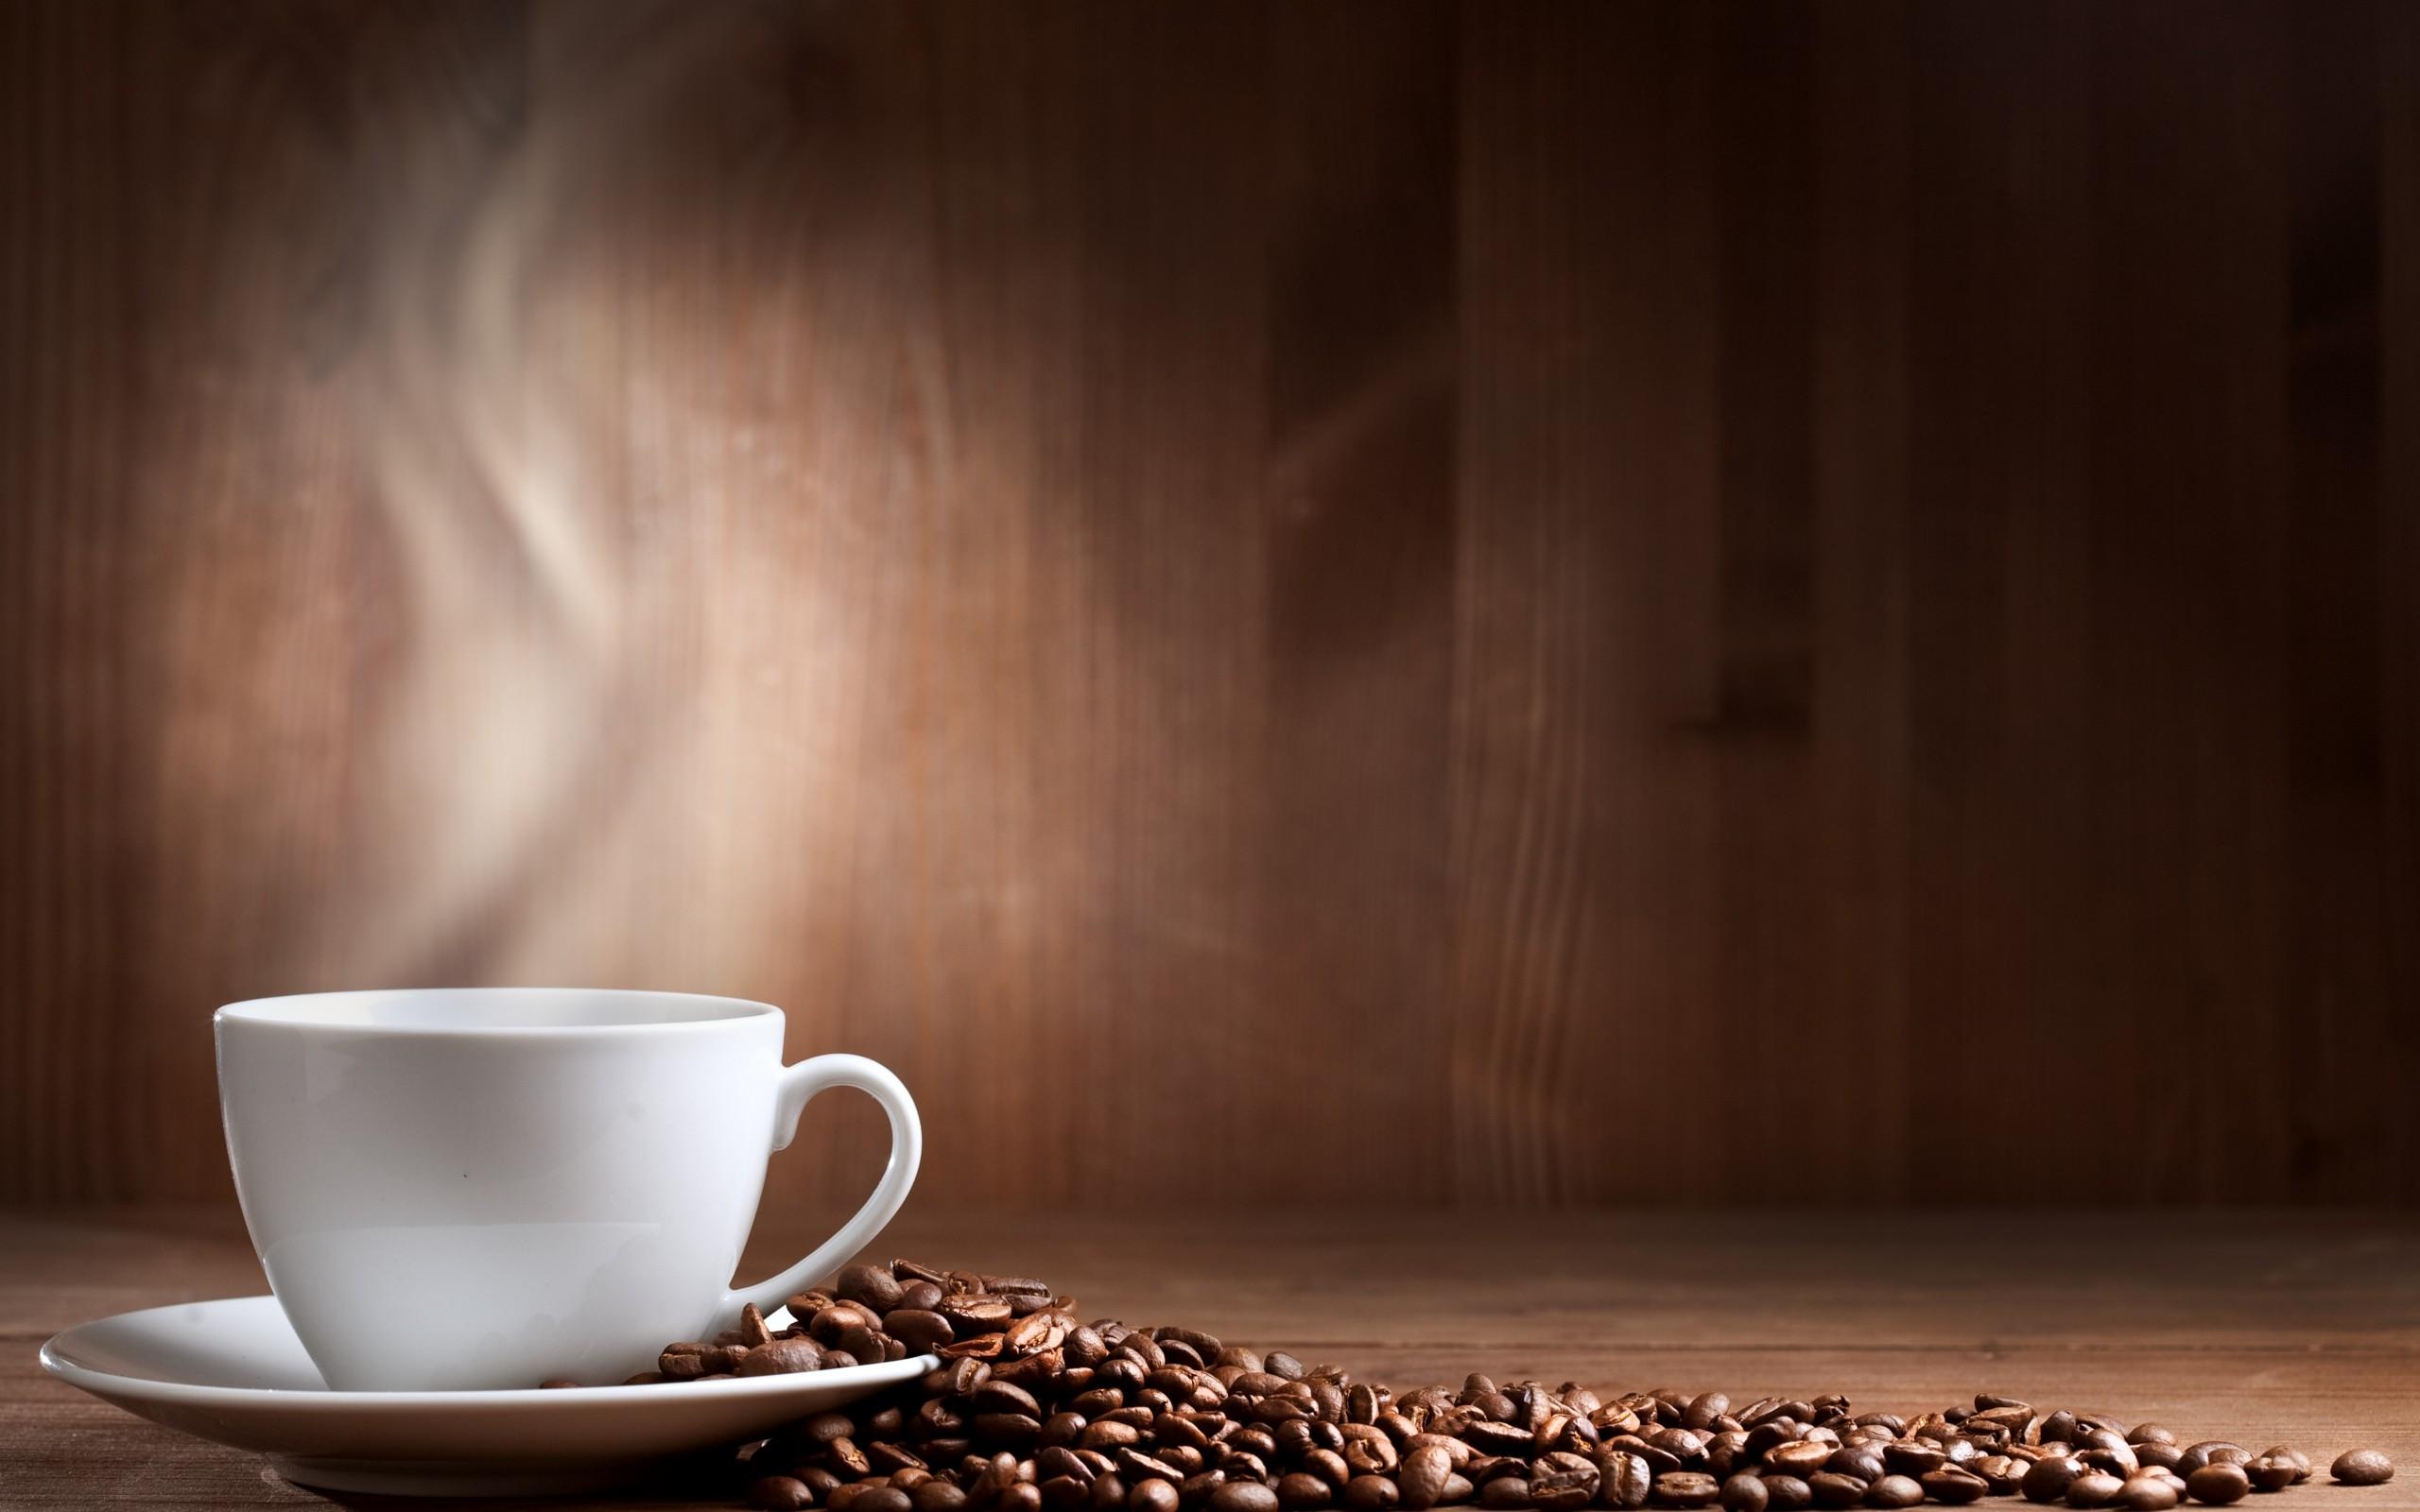 Coffee Background 45 - [2560x1600]